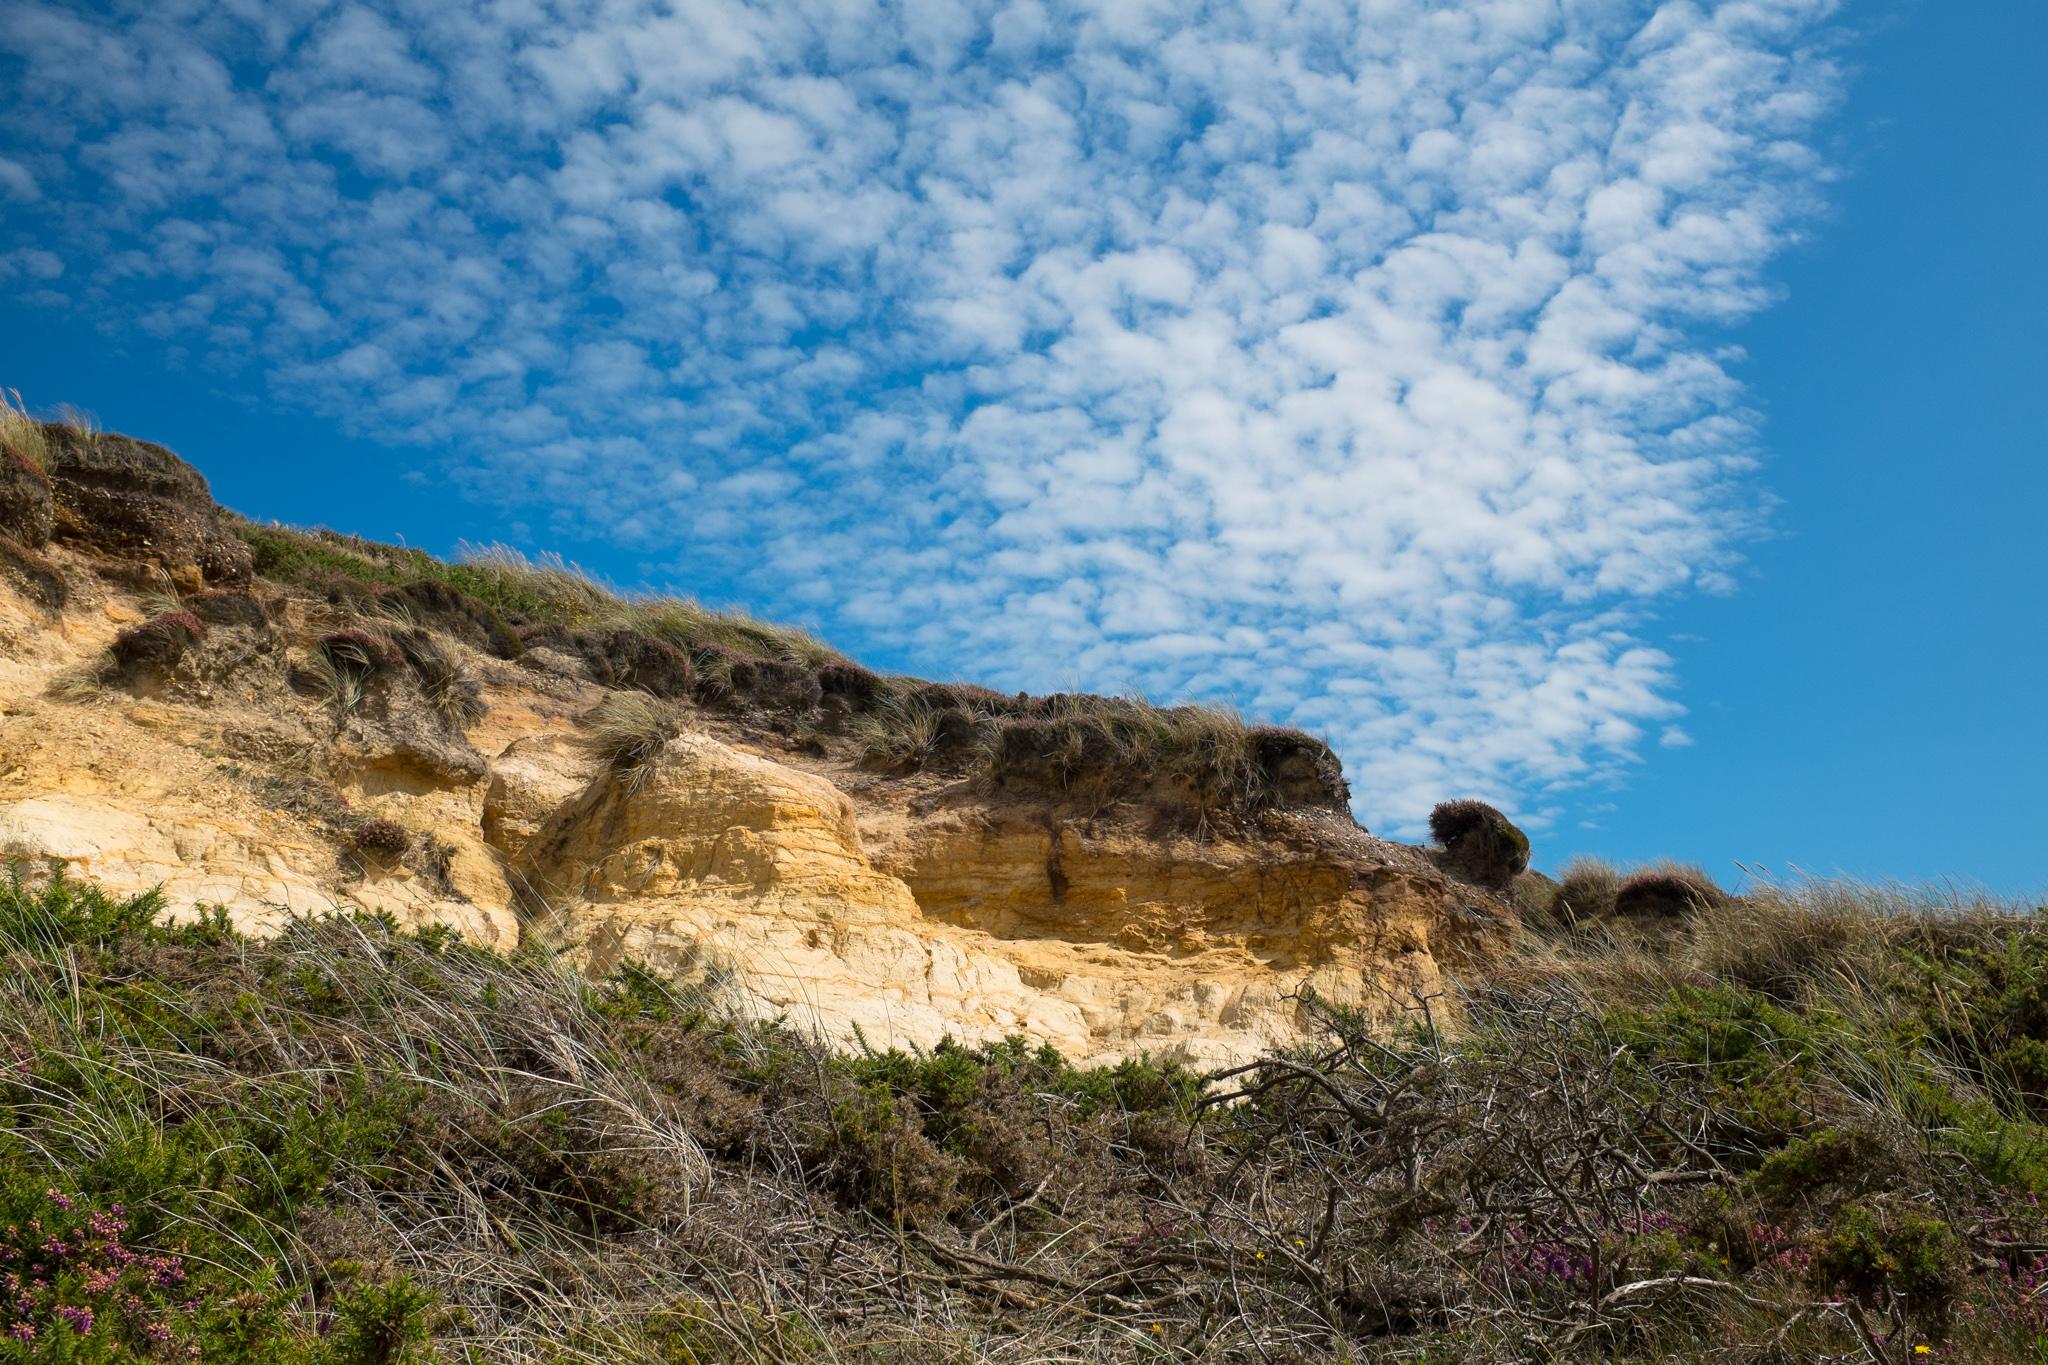 4806-nature-lymington-landscape.jpg